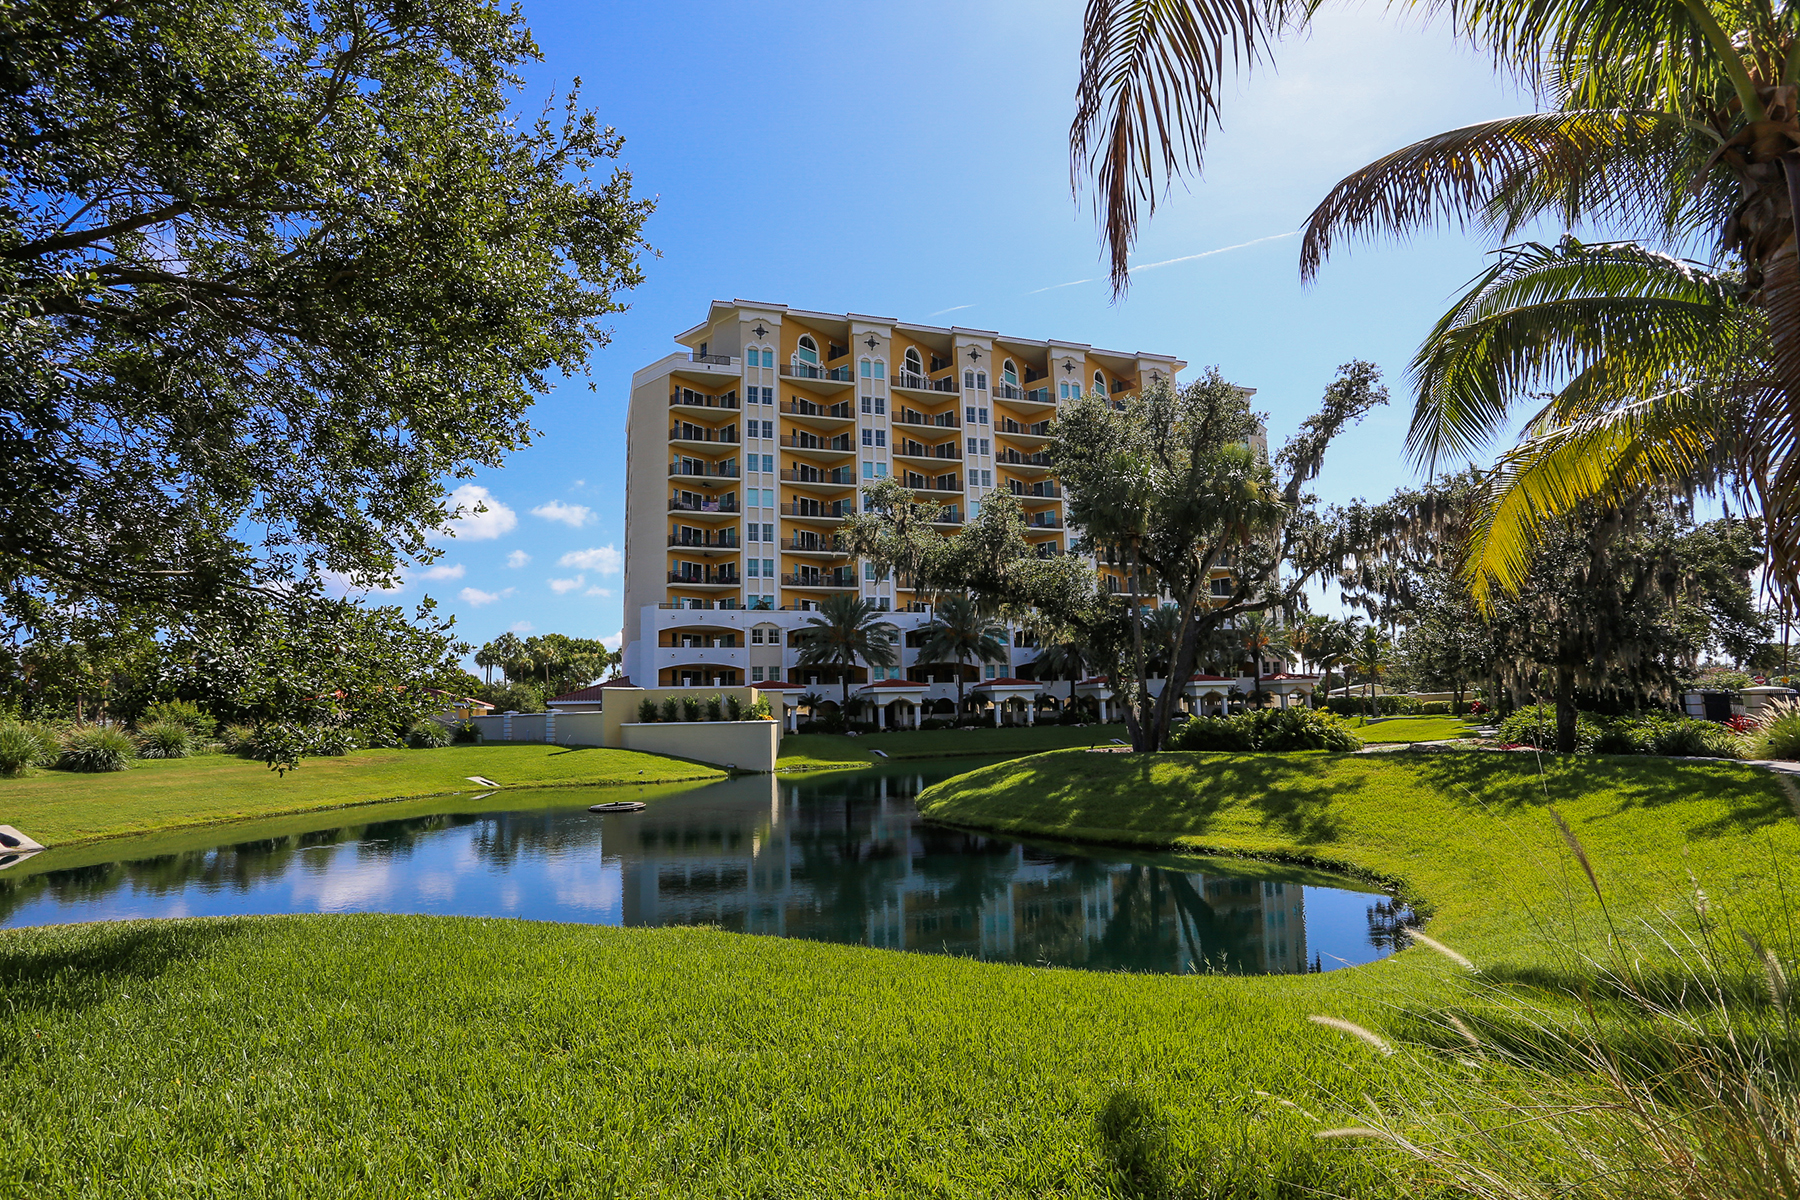 Condomínio para Venda às THE PALMS AT RIVIERA DUNES 501 Haben Blvd 804 Palmetto, Florida, 34221 Estados Unidos